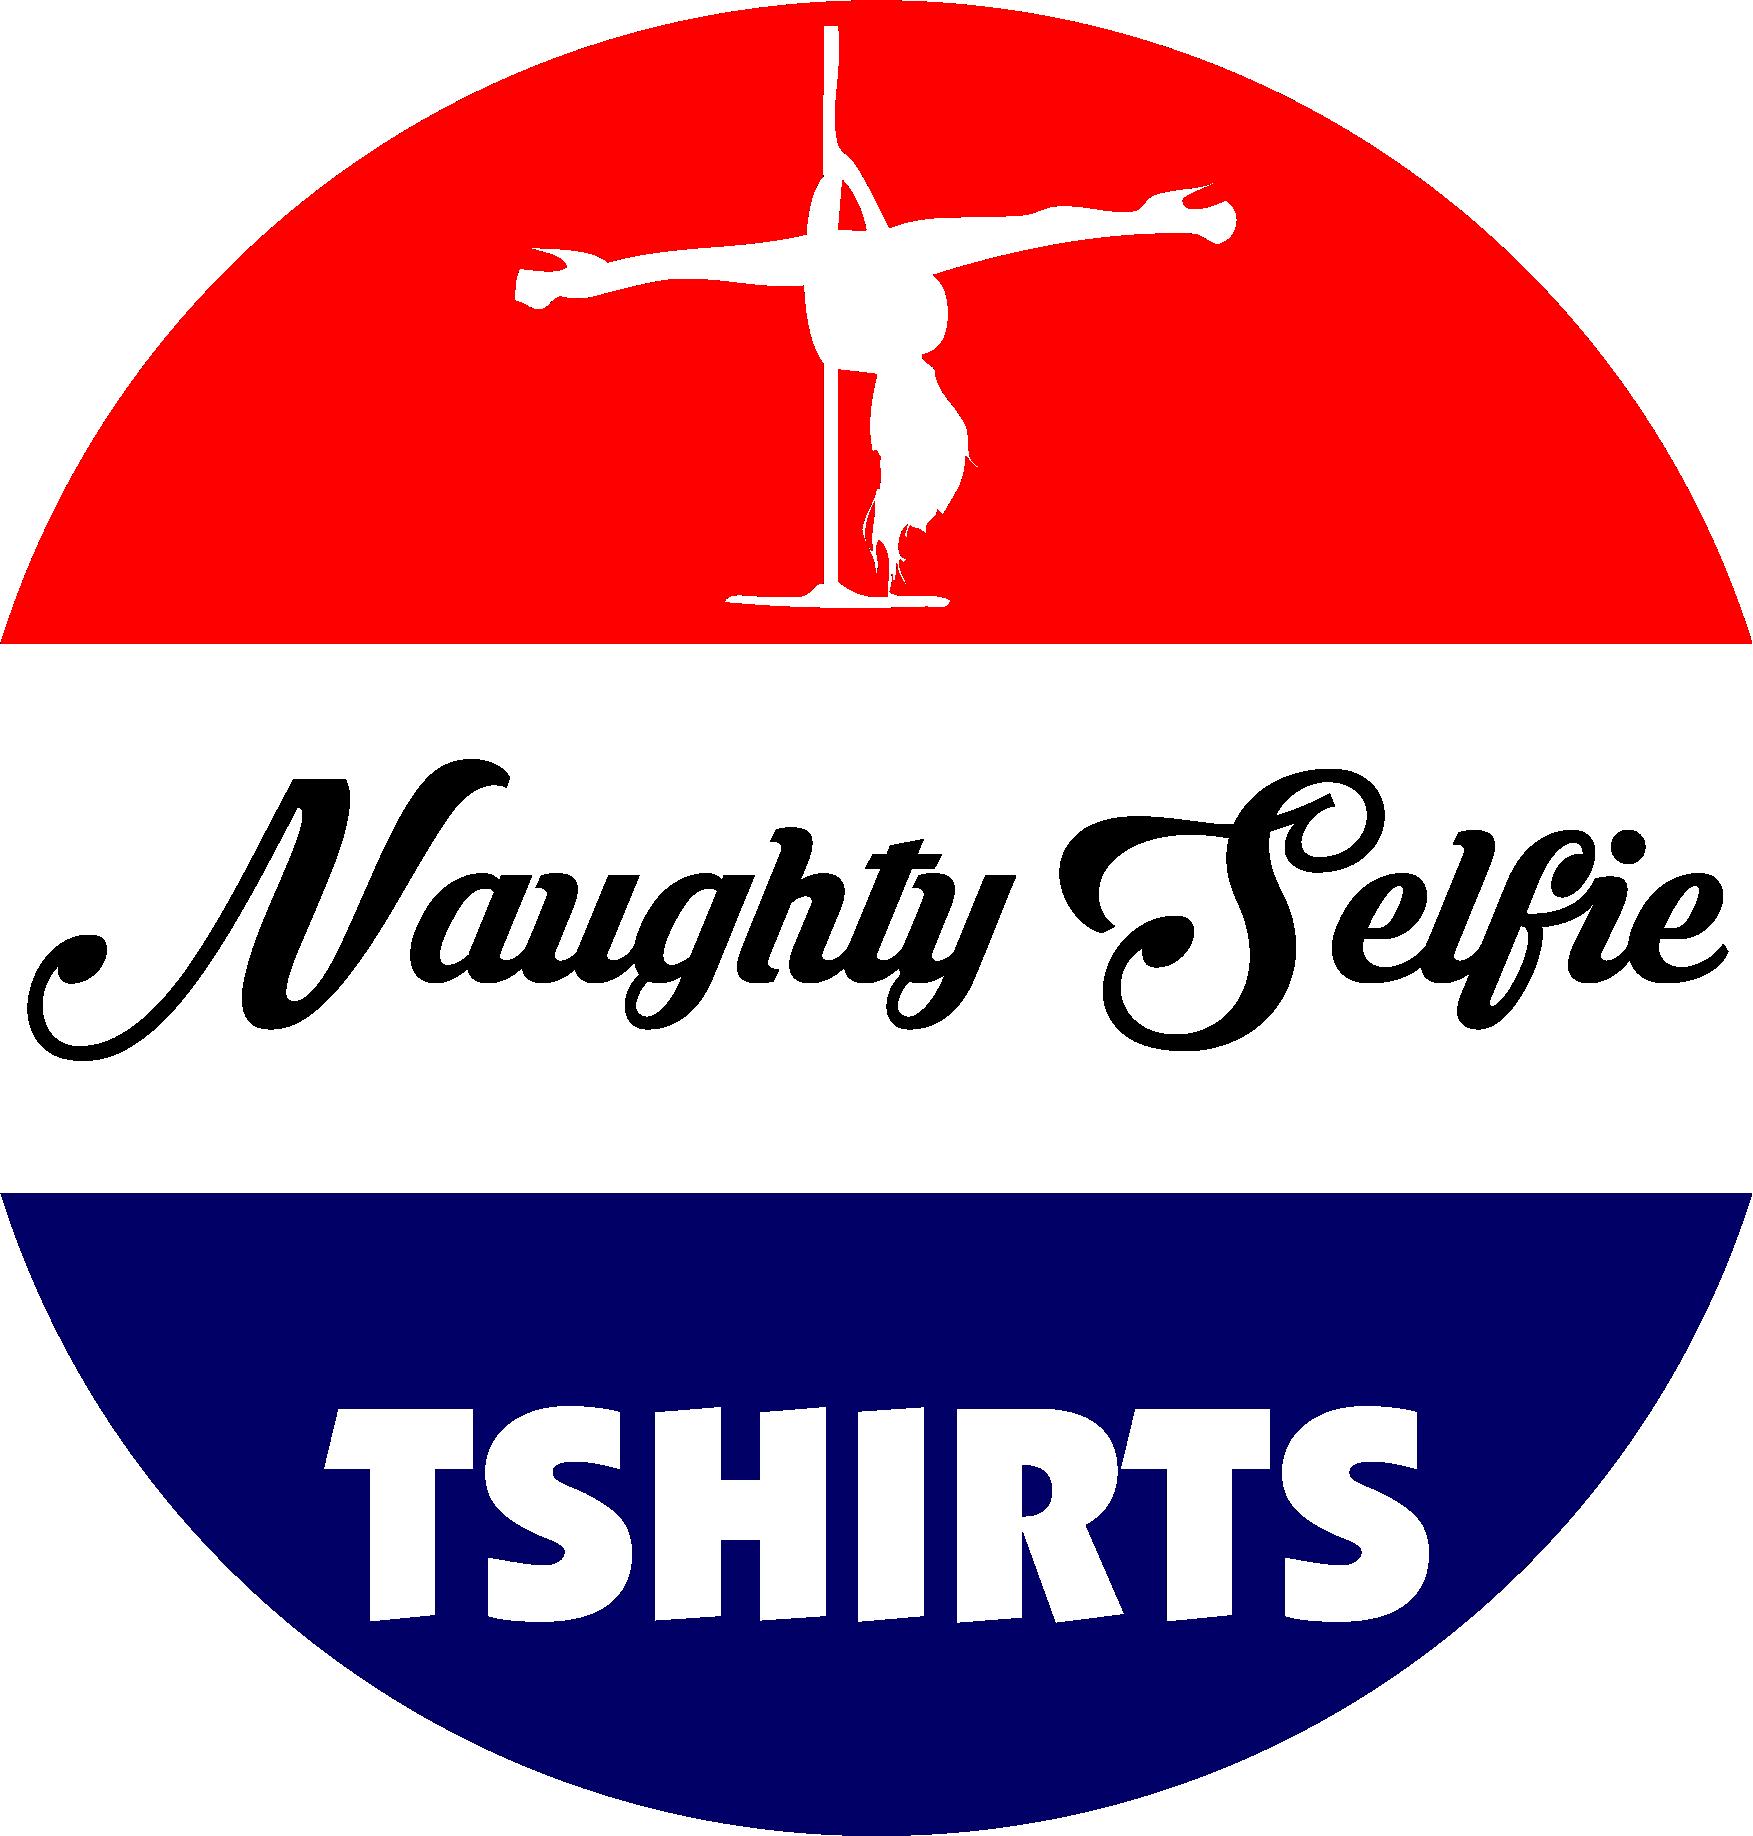 Naughty Selfie Tshirts